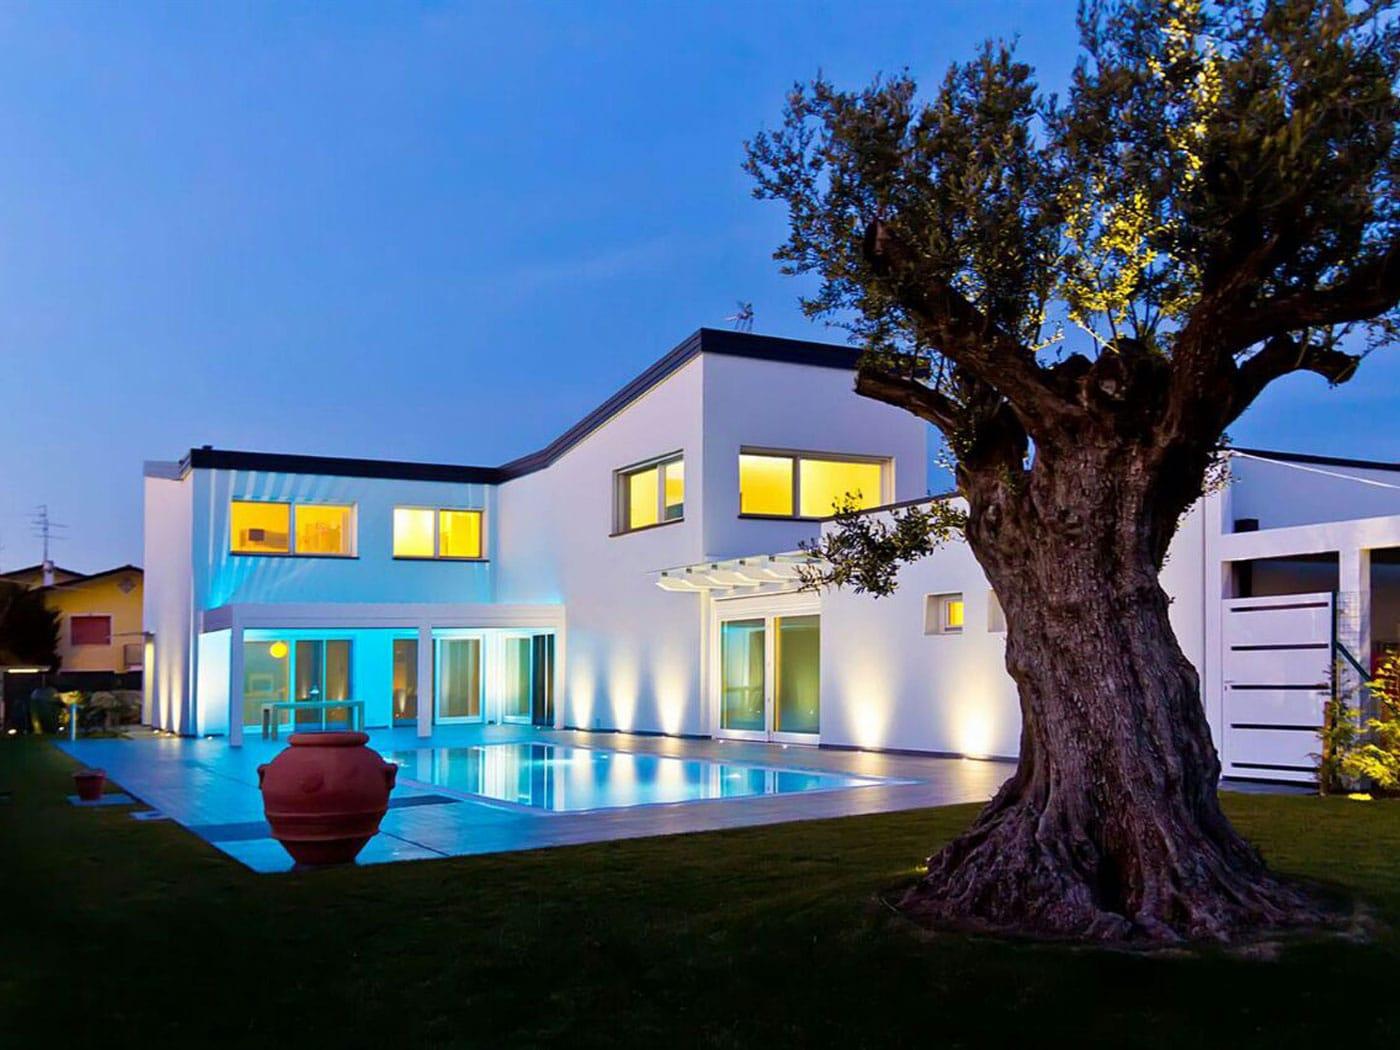 Villa con piscina zoppelletto srl for Ville moderne con piscina